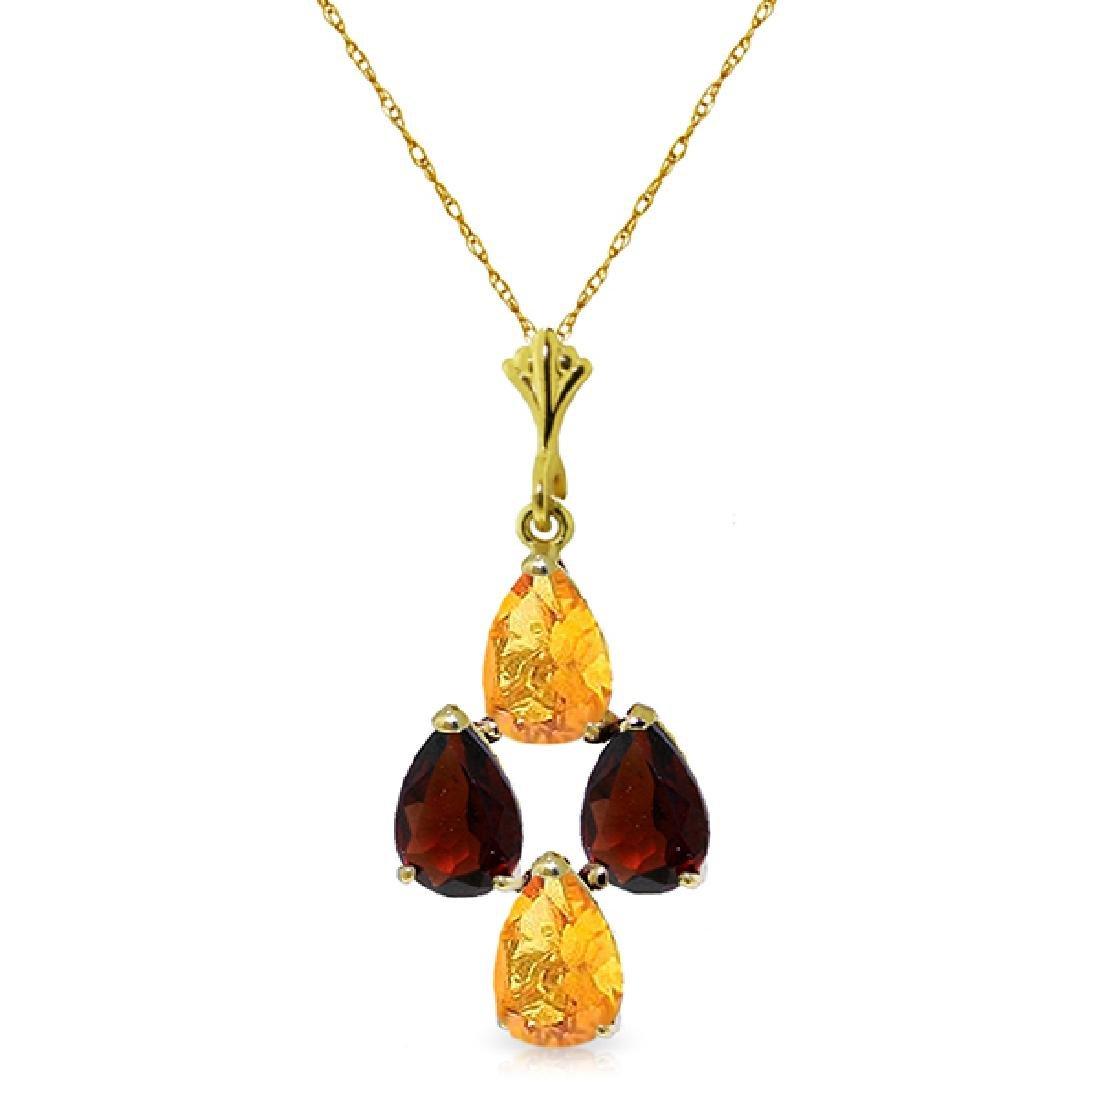 Genuine 1.50 ctw Citrine & Garnet Necklace Jewelry 14KT